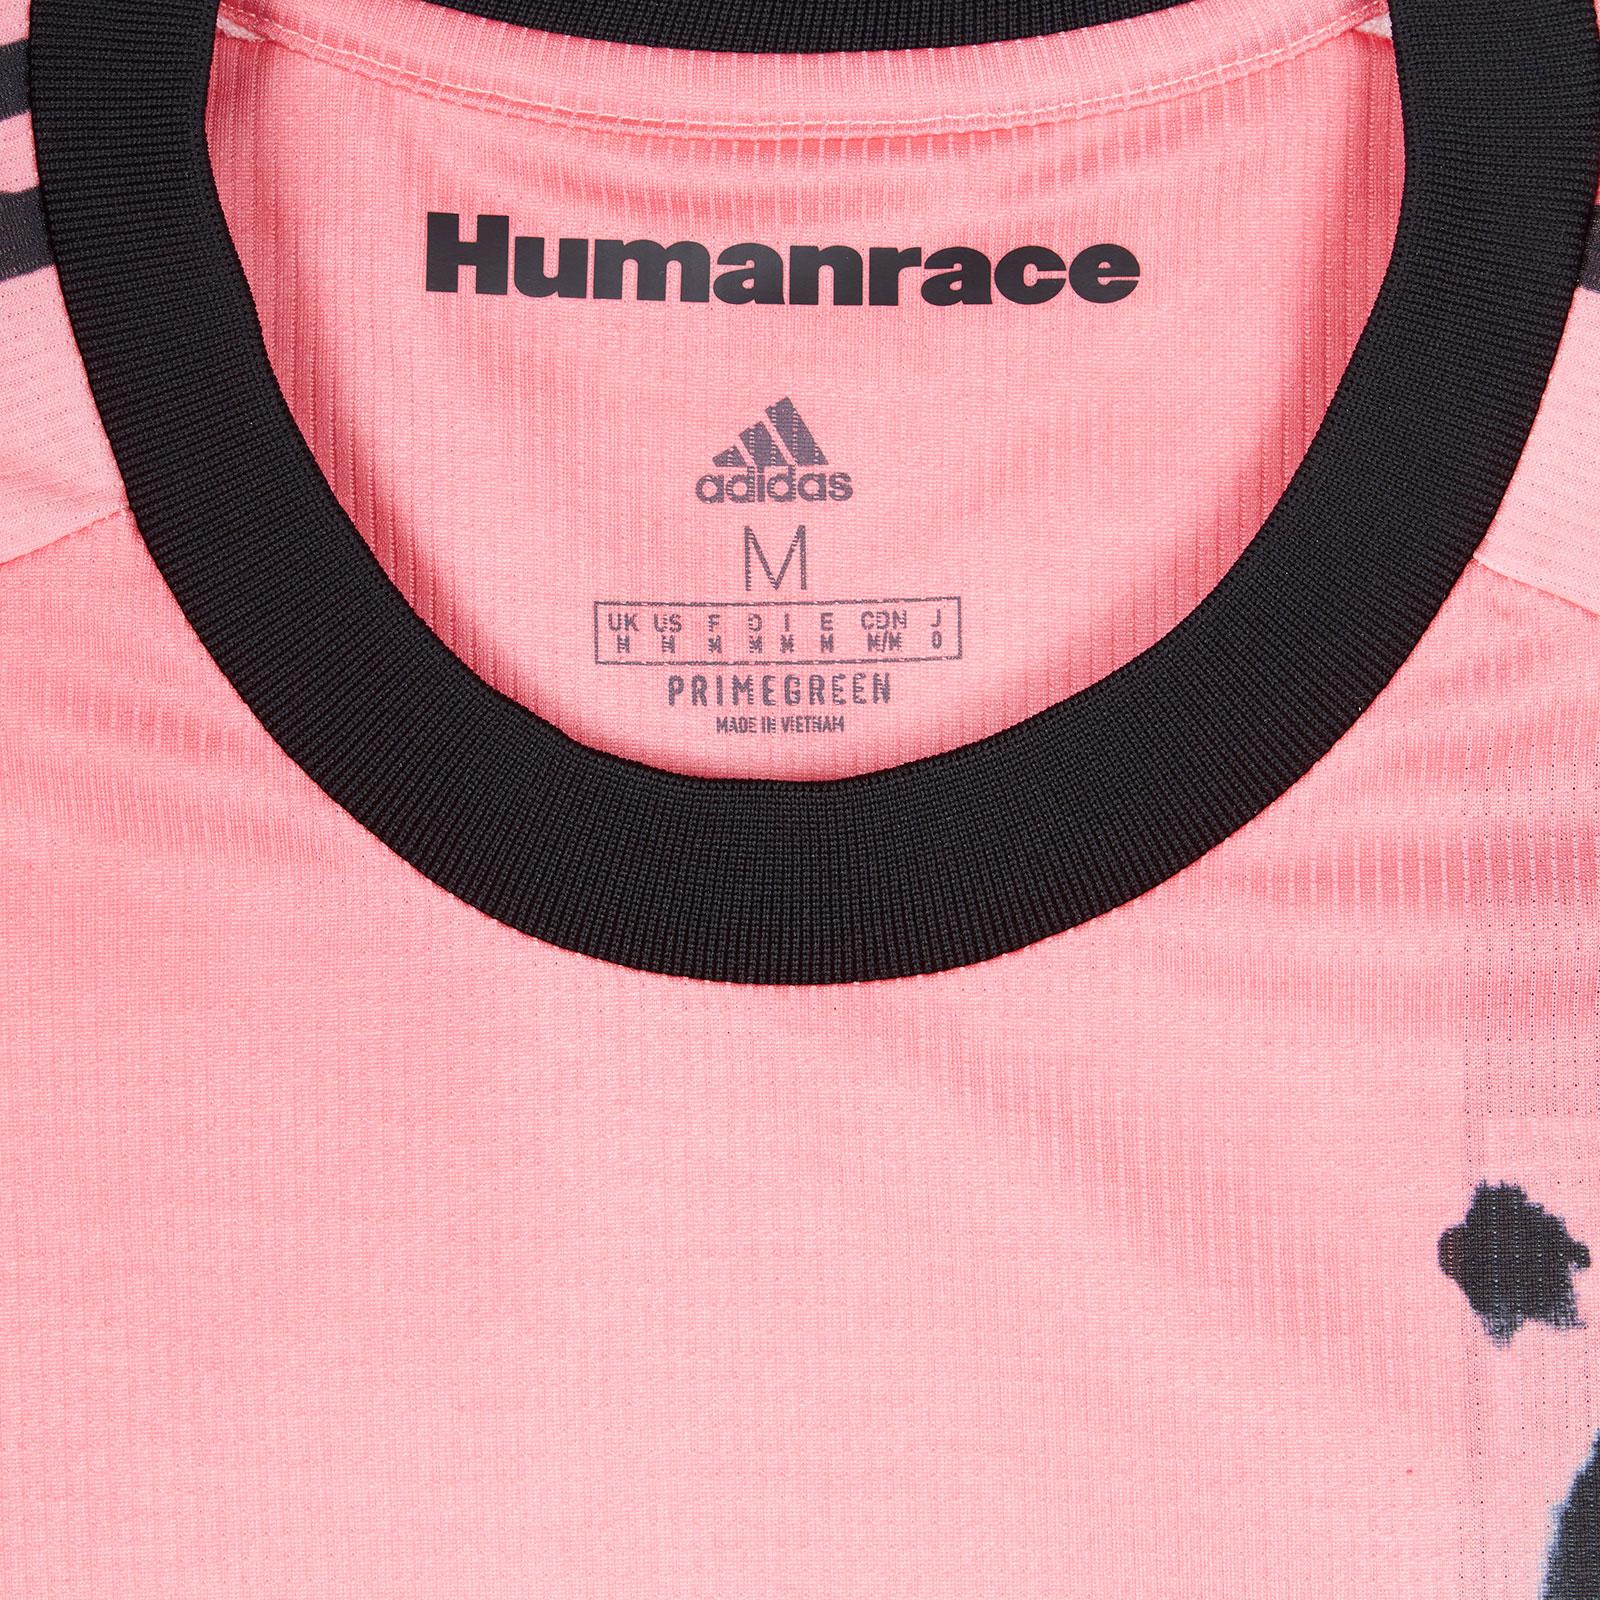 adidas juventus human race jersey gj9096 sneakersnstuff sneakers streetwear online since 1999 adidas juventus human race jersey